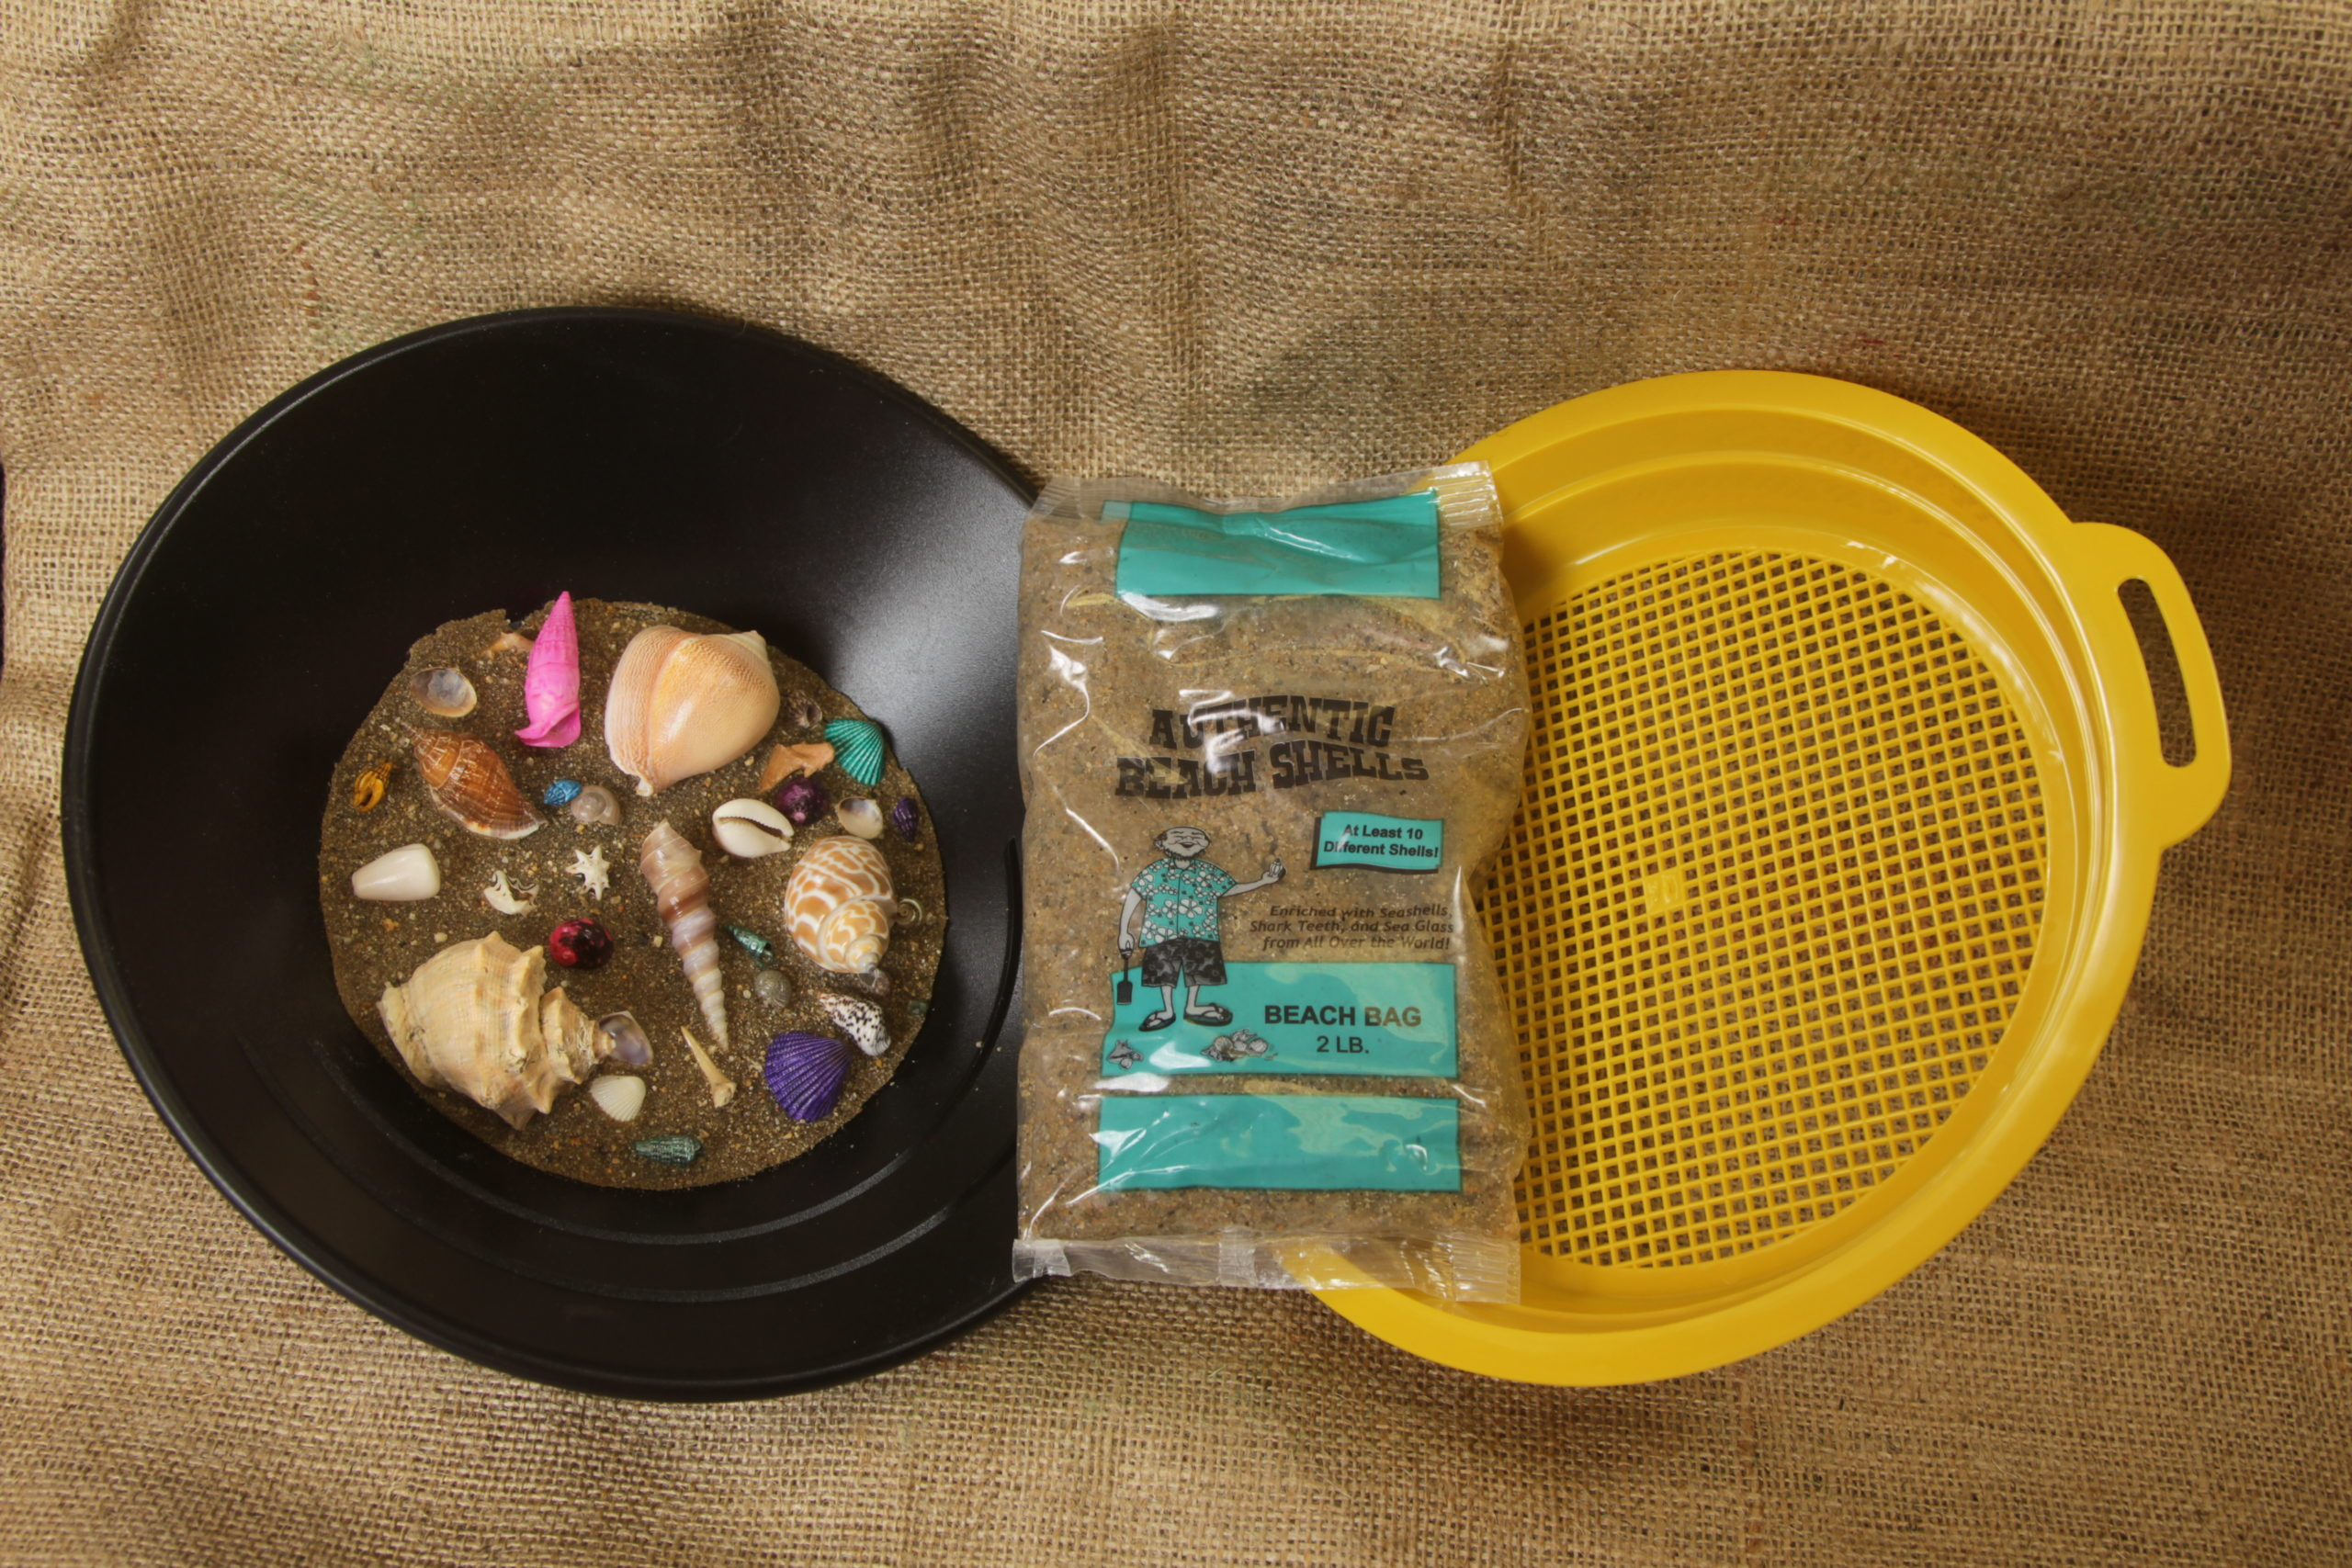 Teal Bag Seal shells kit with sifter